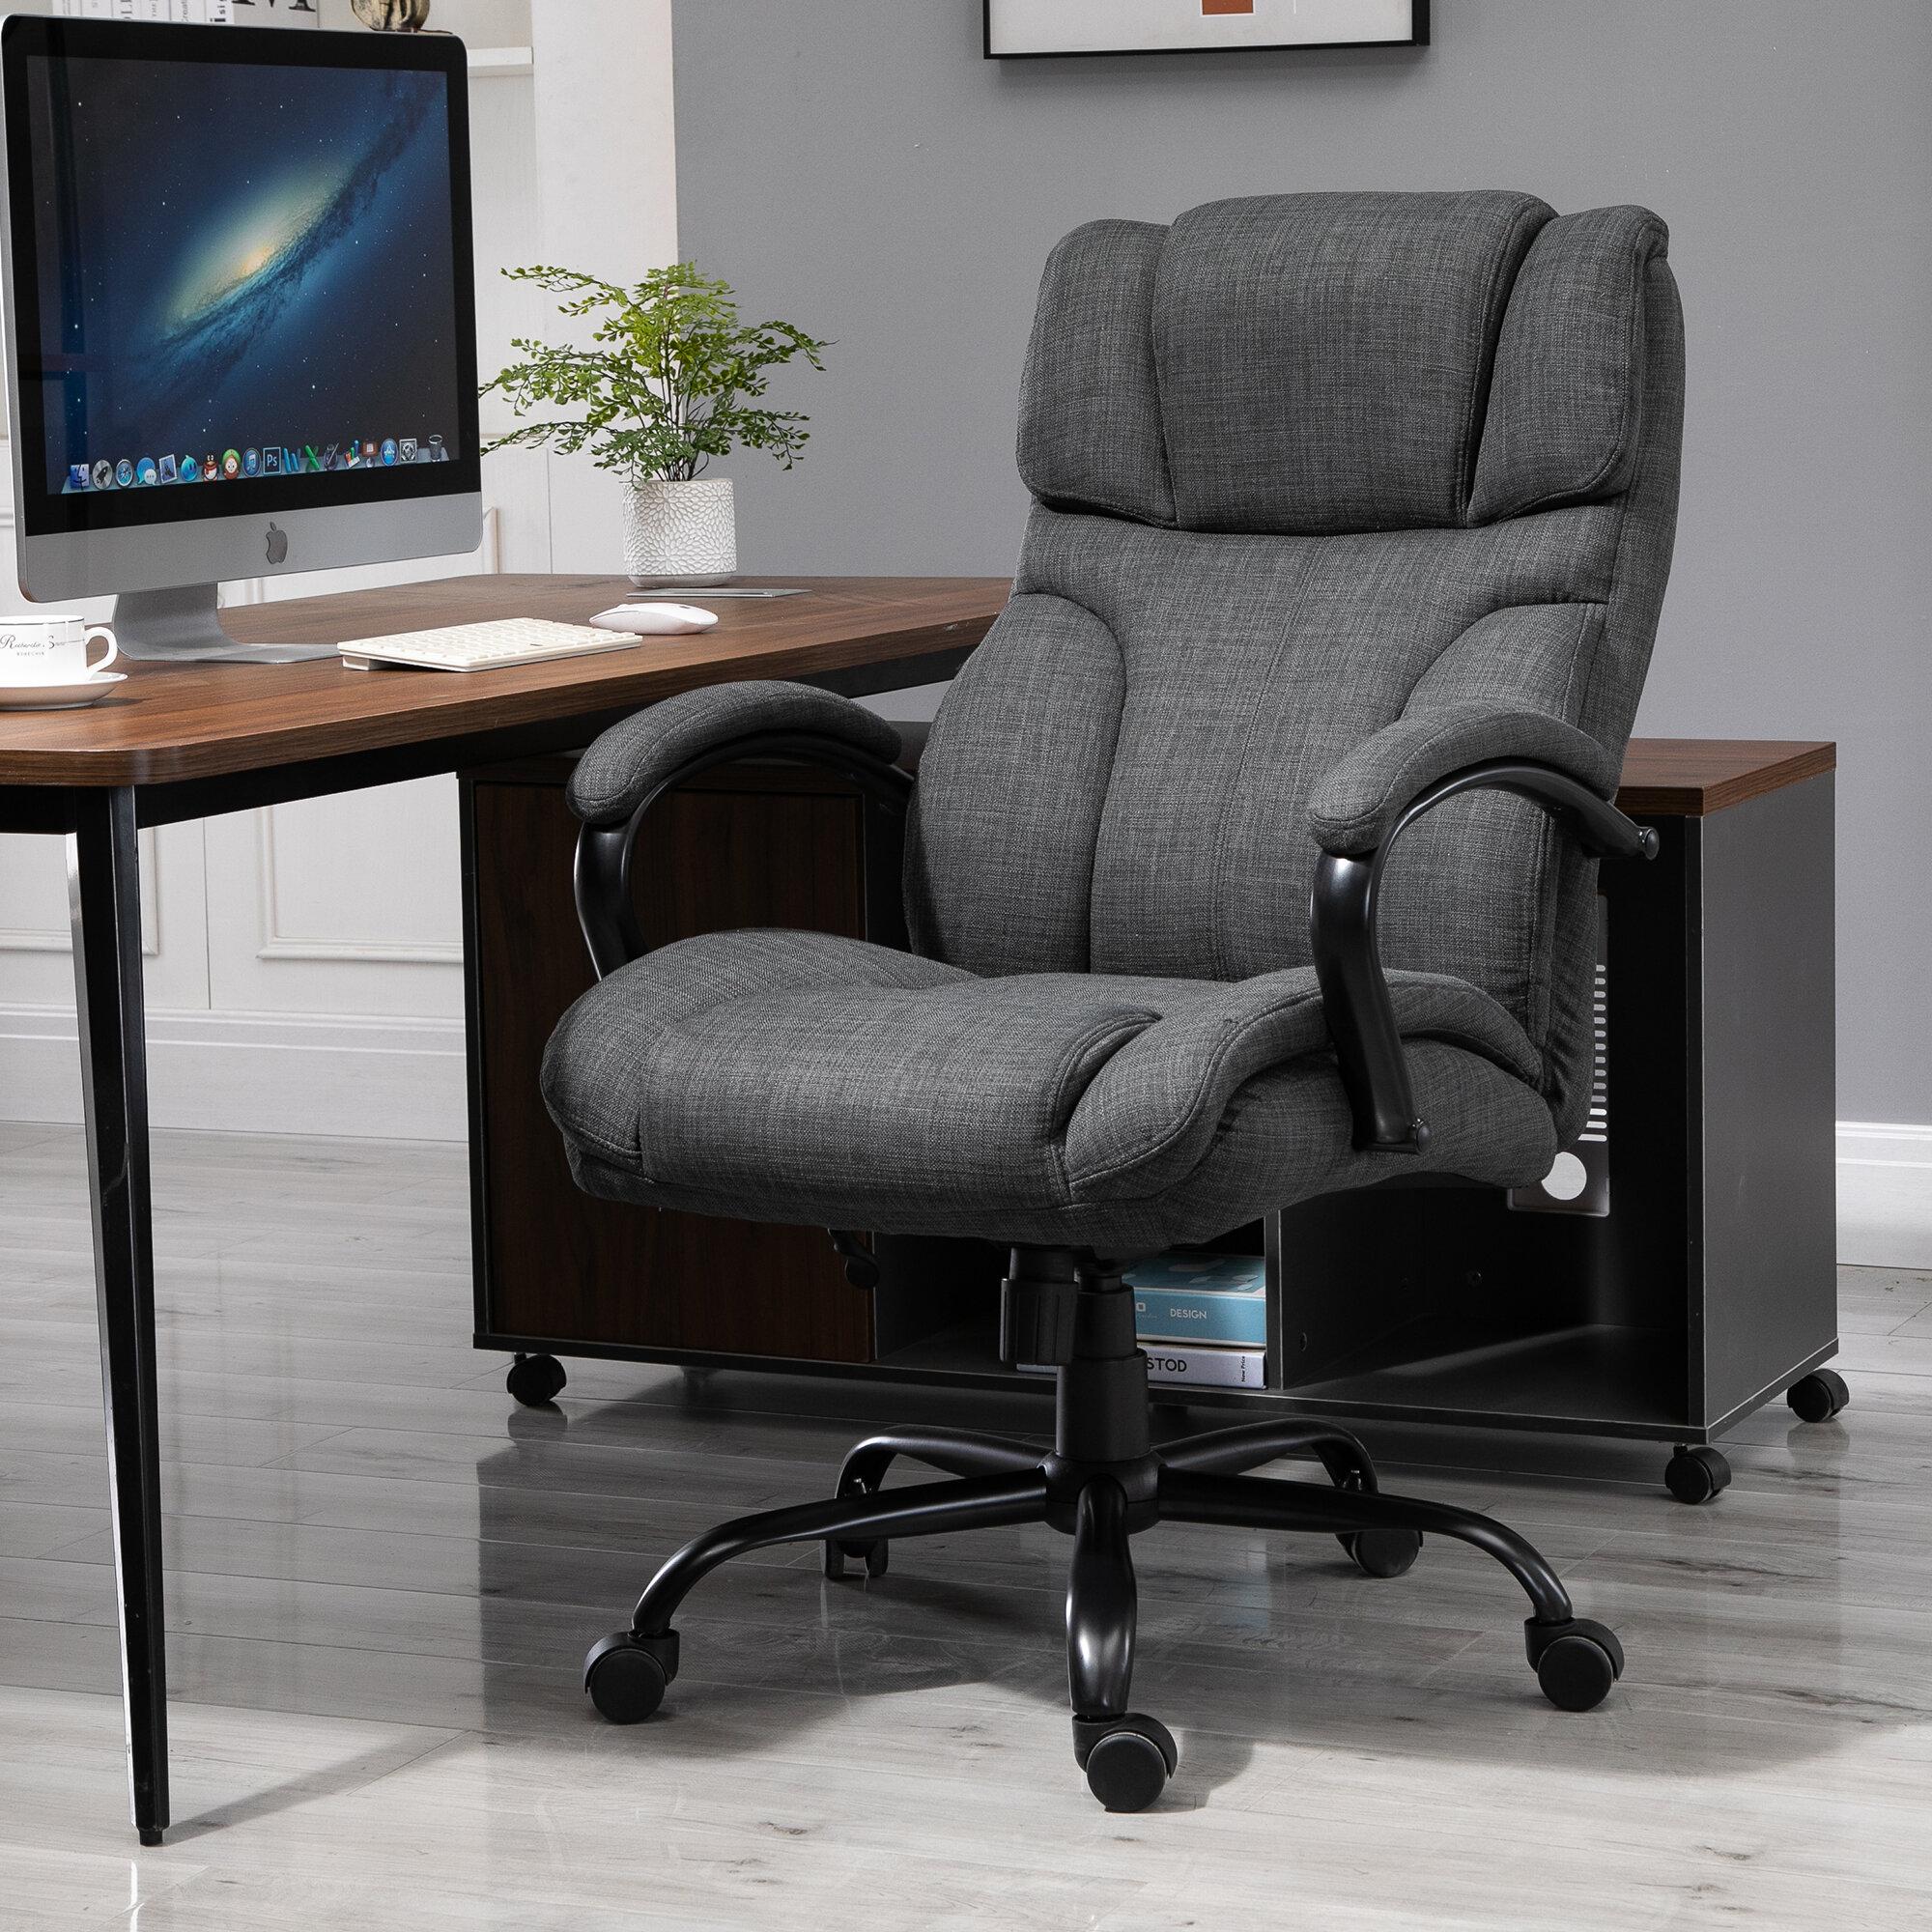 Latitude Run Ergonomic Big And Tall Fabric Office Chair With Wheels Paddedwide Seat Desk Task Seat 360 Swivel Hold Up To 500lbs Deep Grey Reviews Wayfair Ca